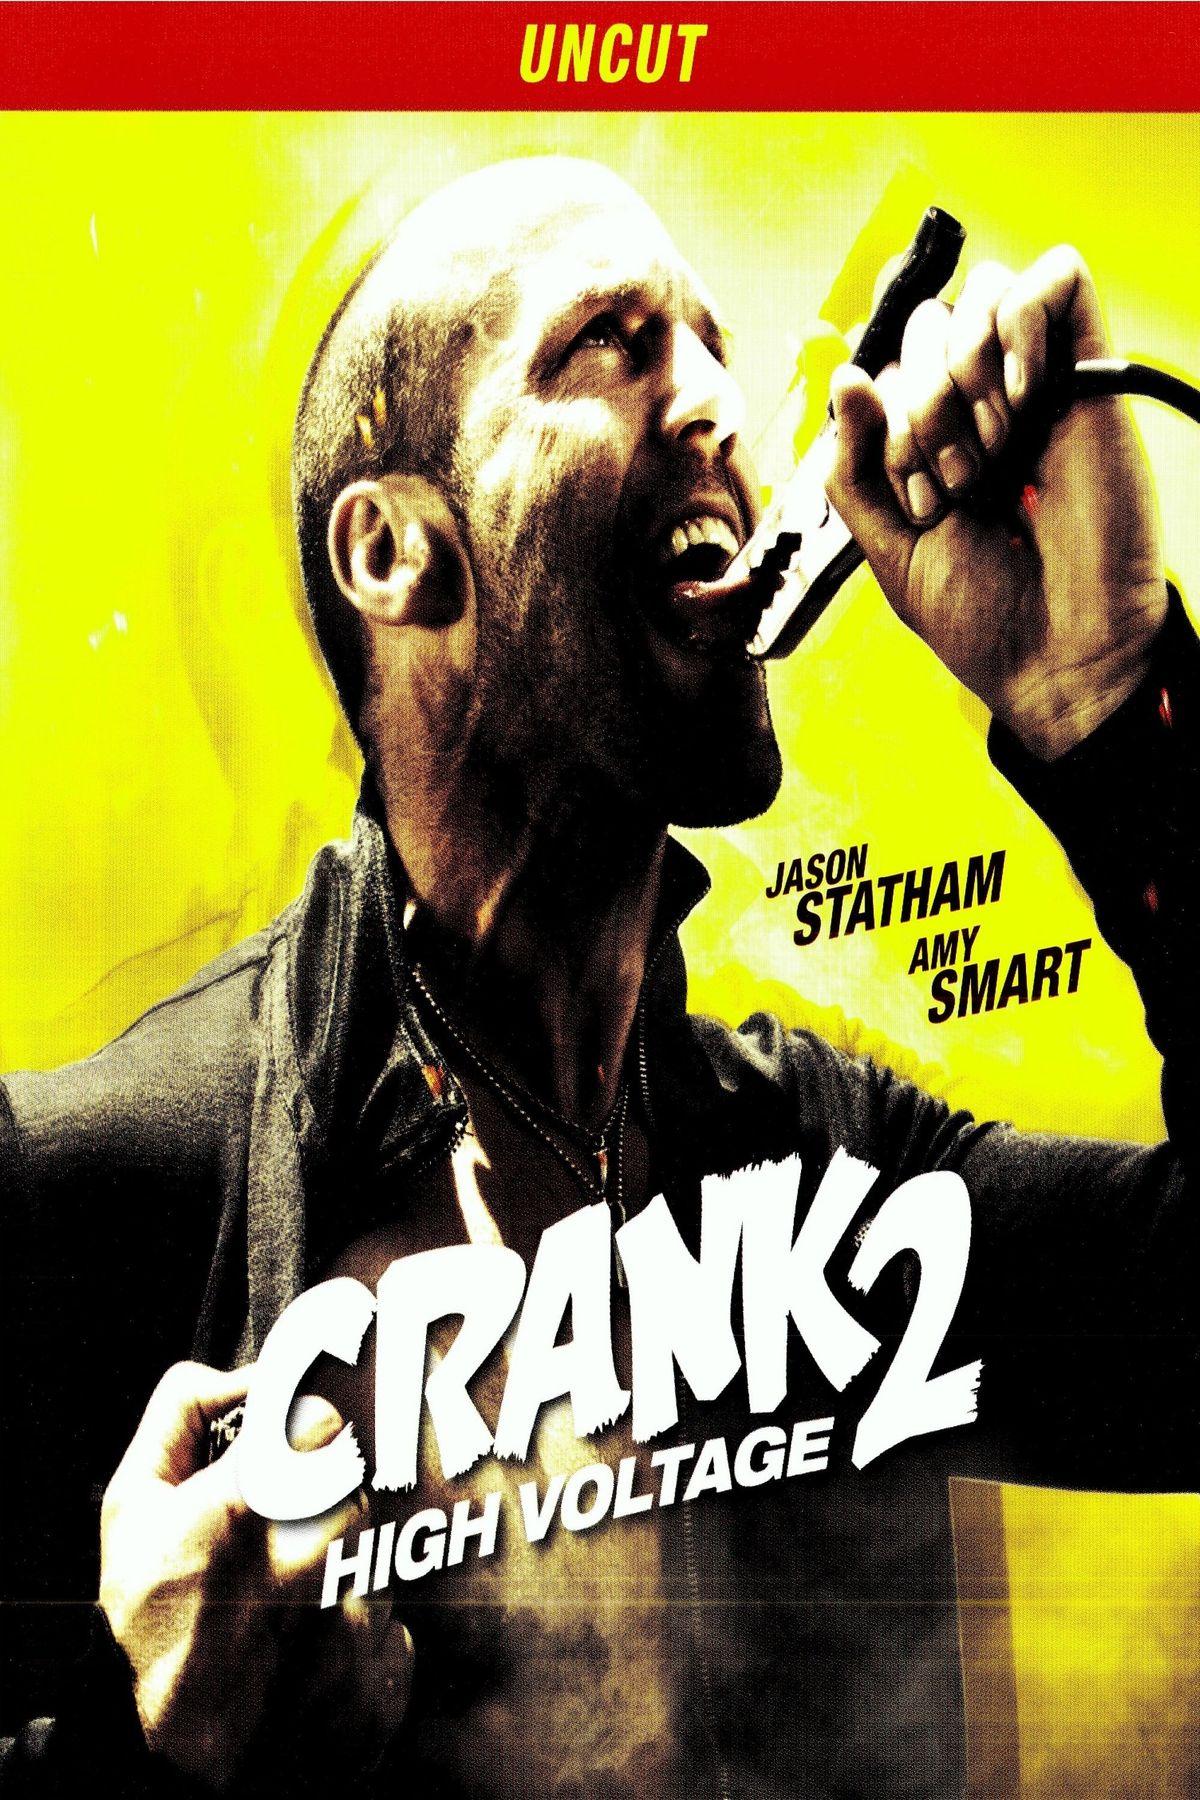 Crank: High Voltage